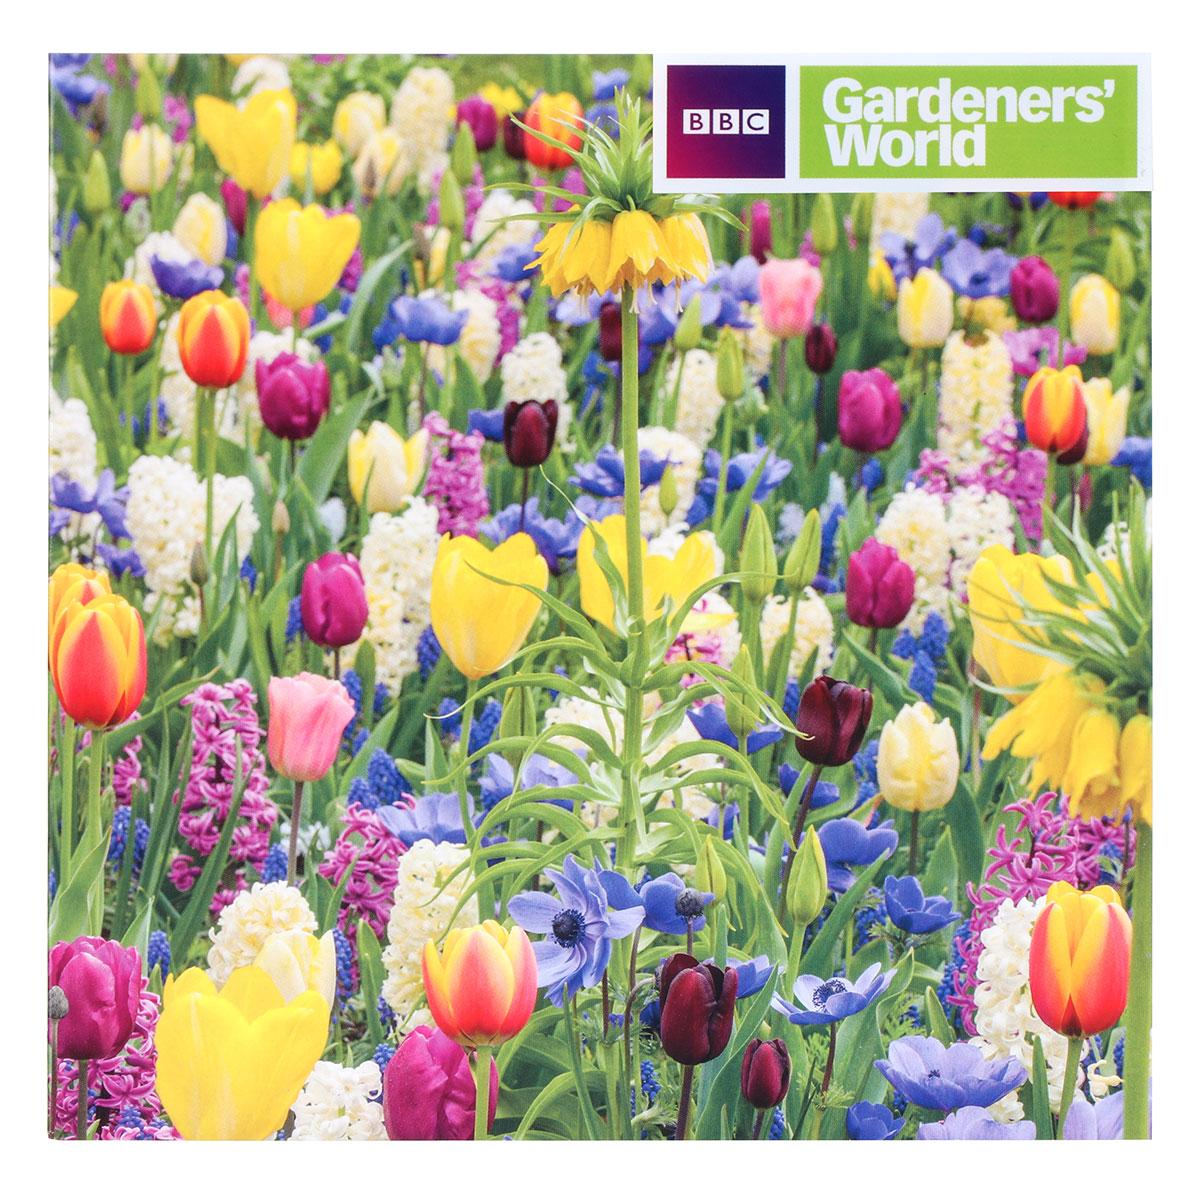 Gardeners' World Tulip Meadow Greeting Card